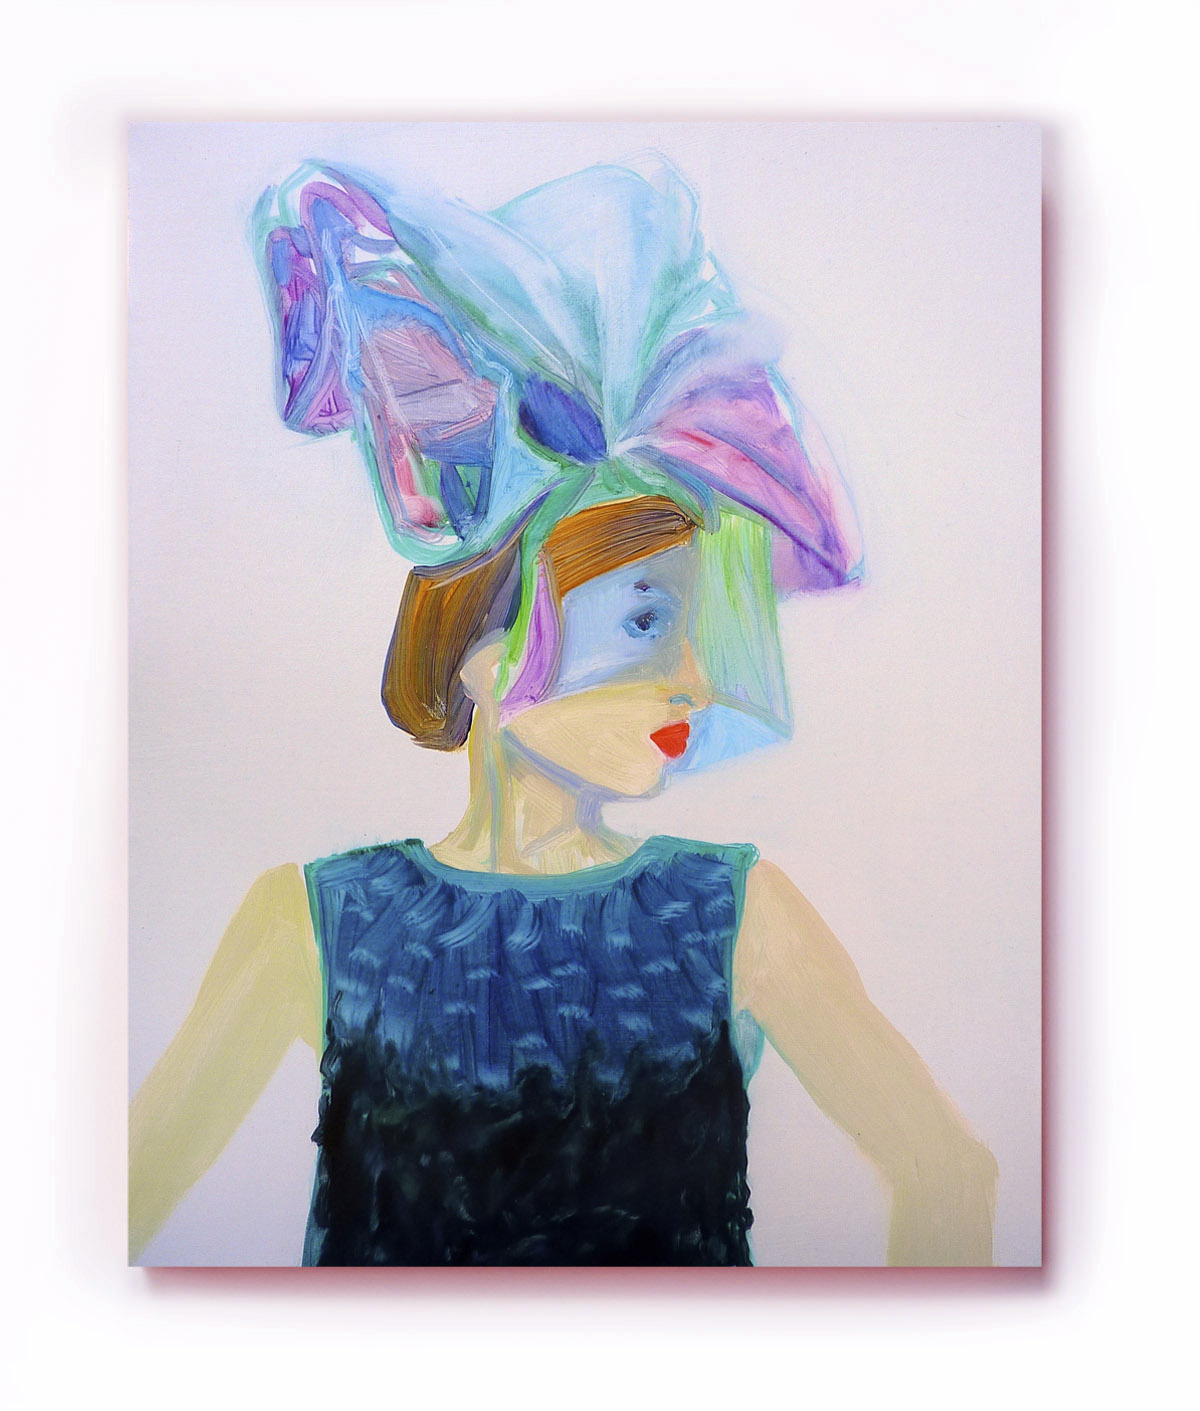 Cellophane Hat, oil on canvas, 16 x 20 inches, 2012 © Pilita Garcia